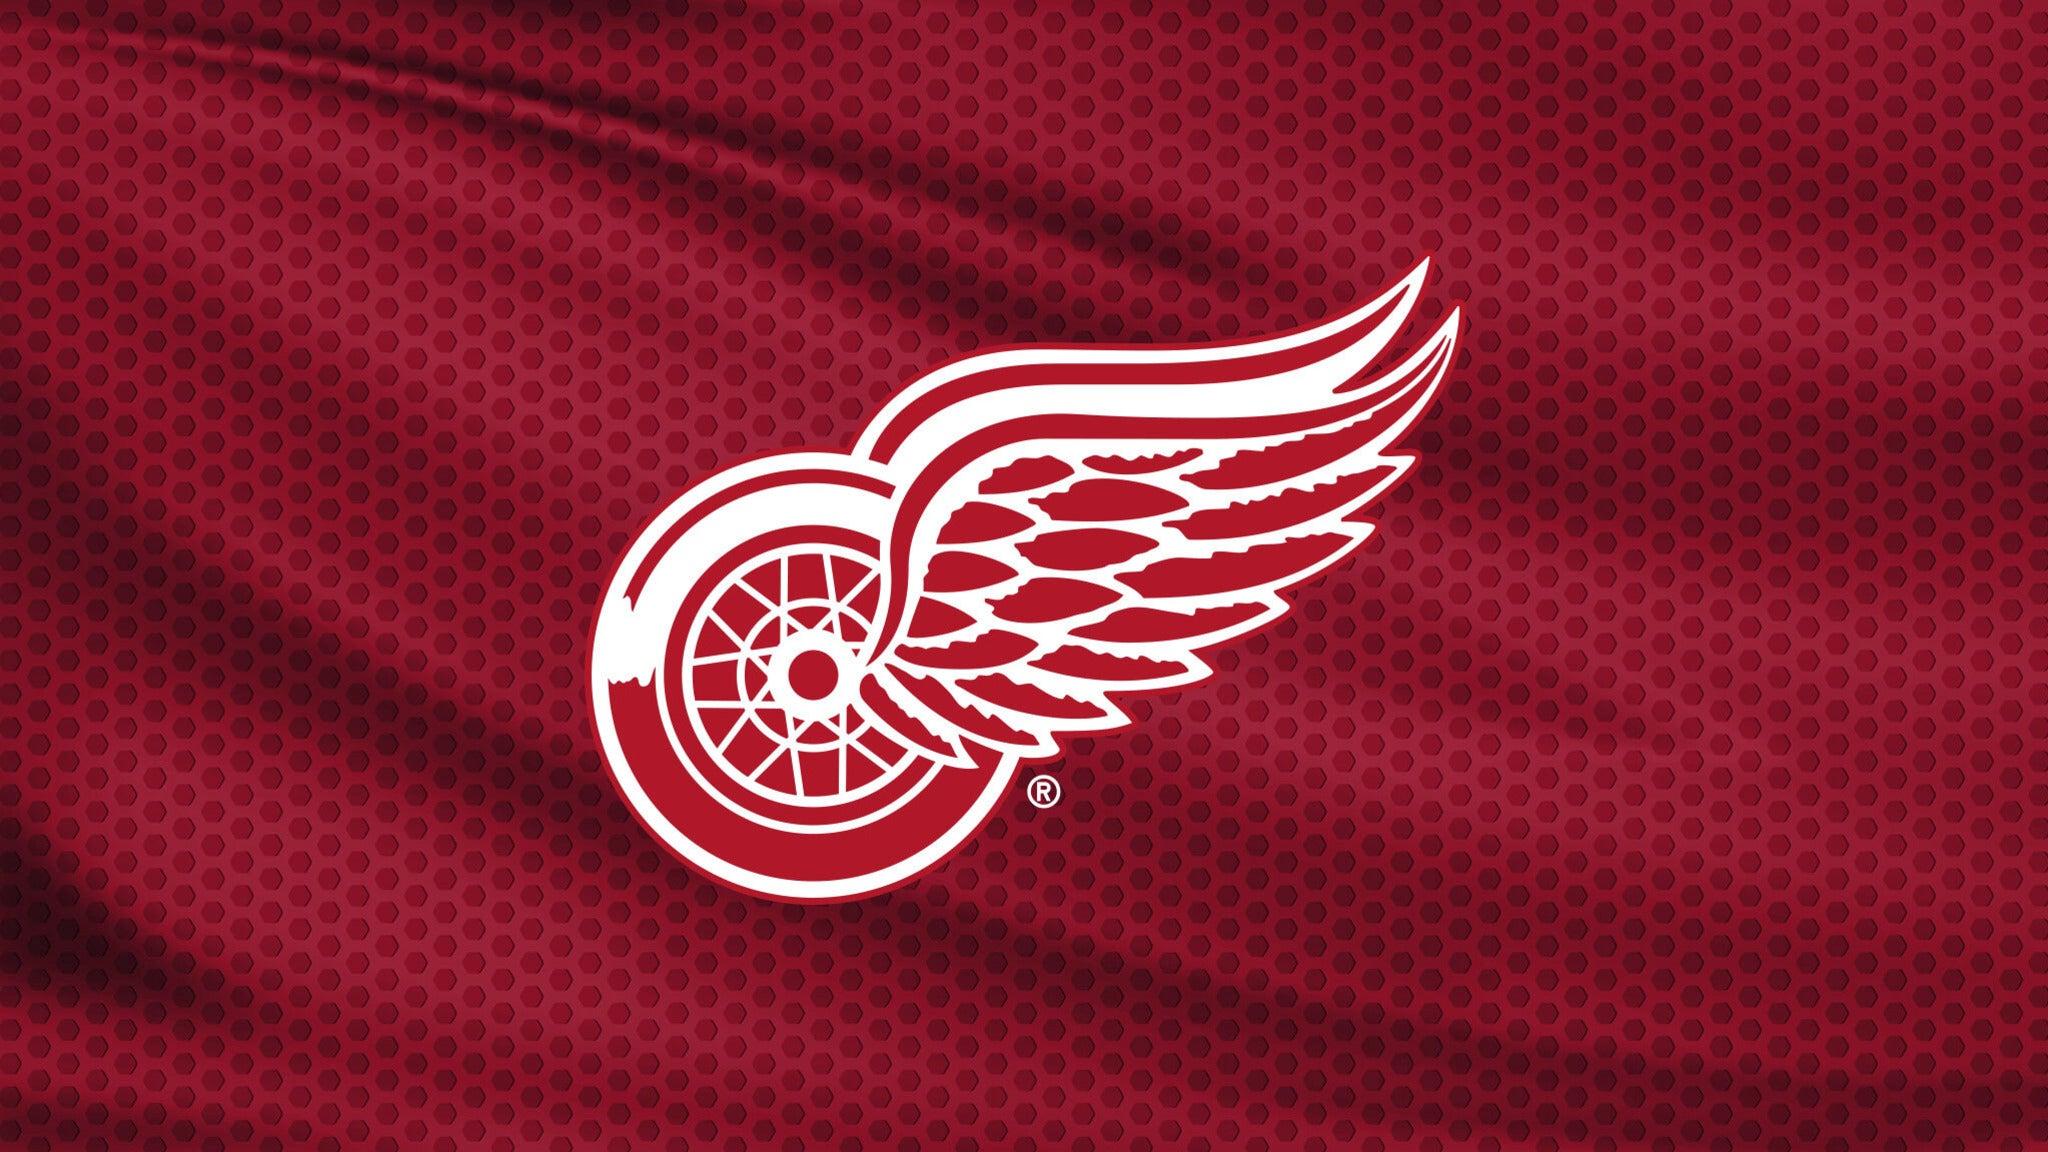 Detroit Red Wings vs. Washington Capitals - Detroit, MI 48201